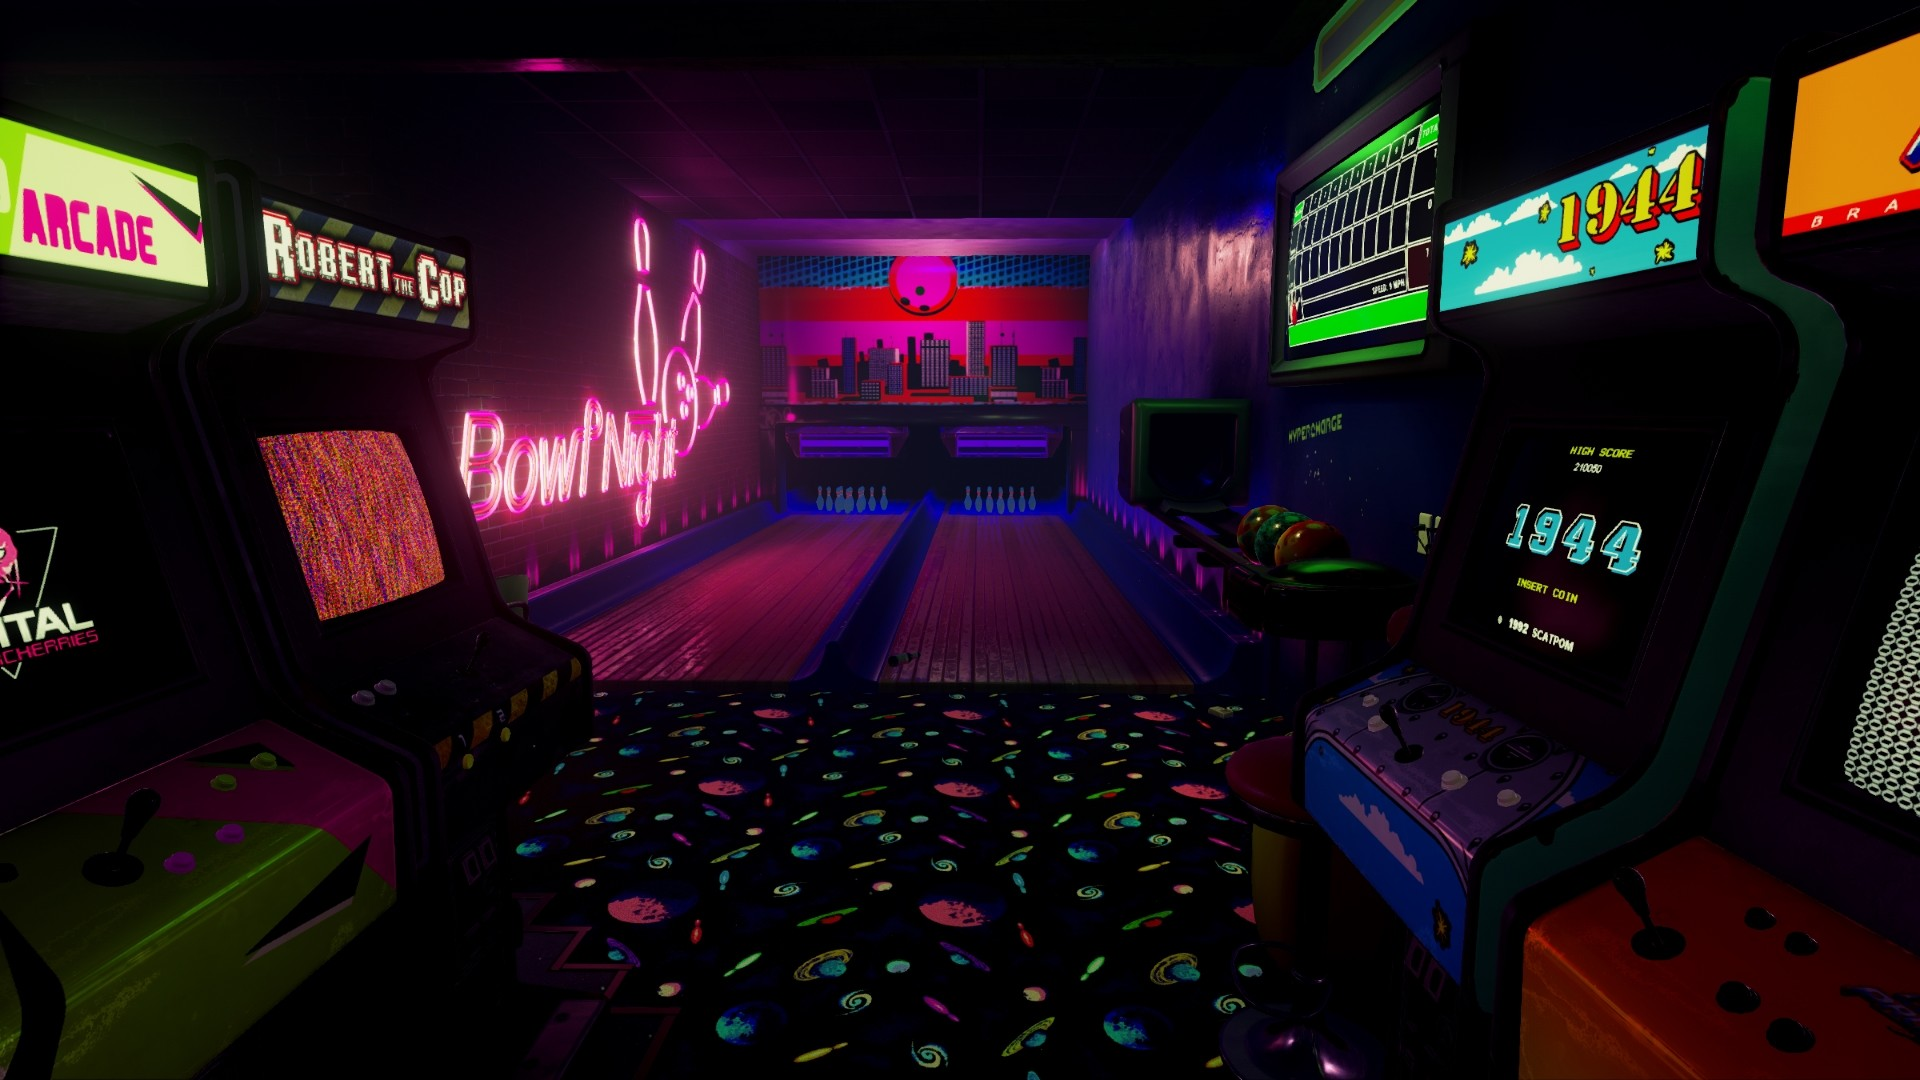 New-Retro-Arcade-Neon-4.jpg (1920×1080)   Neon nights   Pinterest   Pc game  reviews